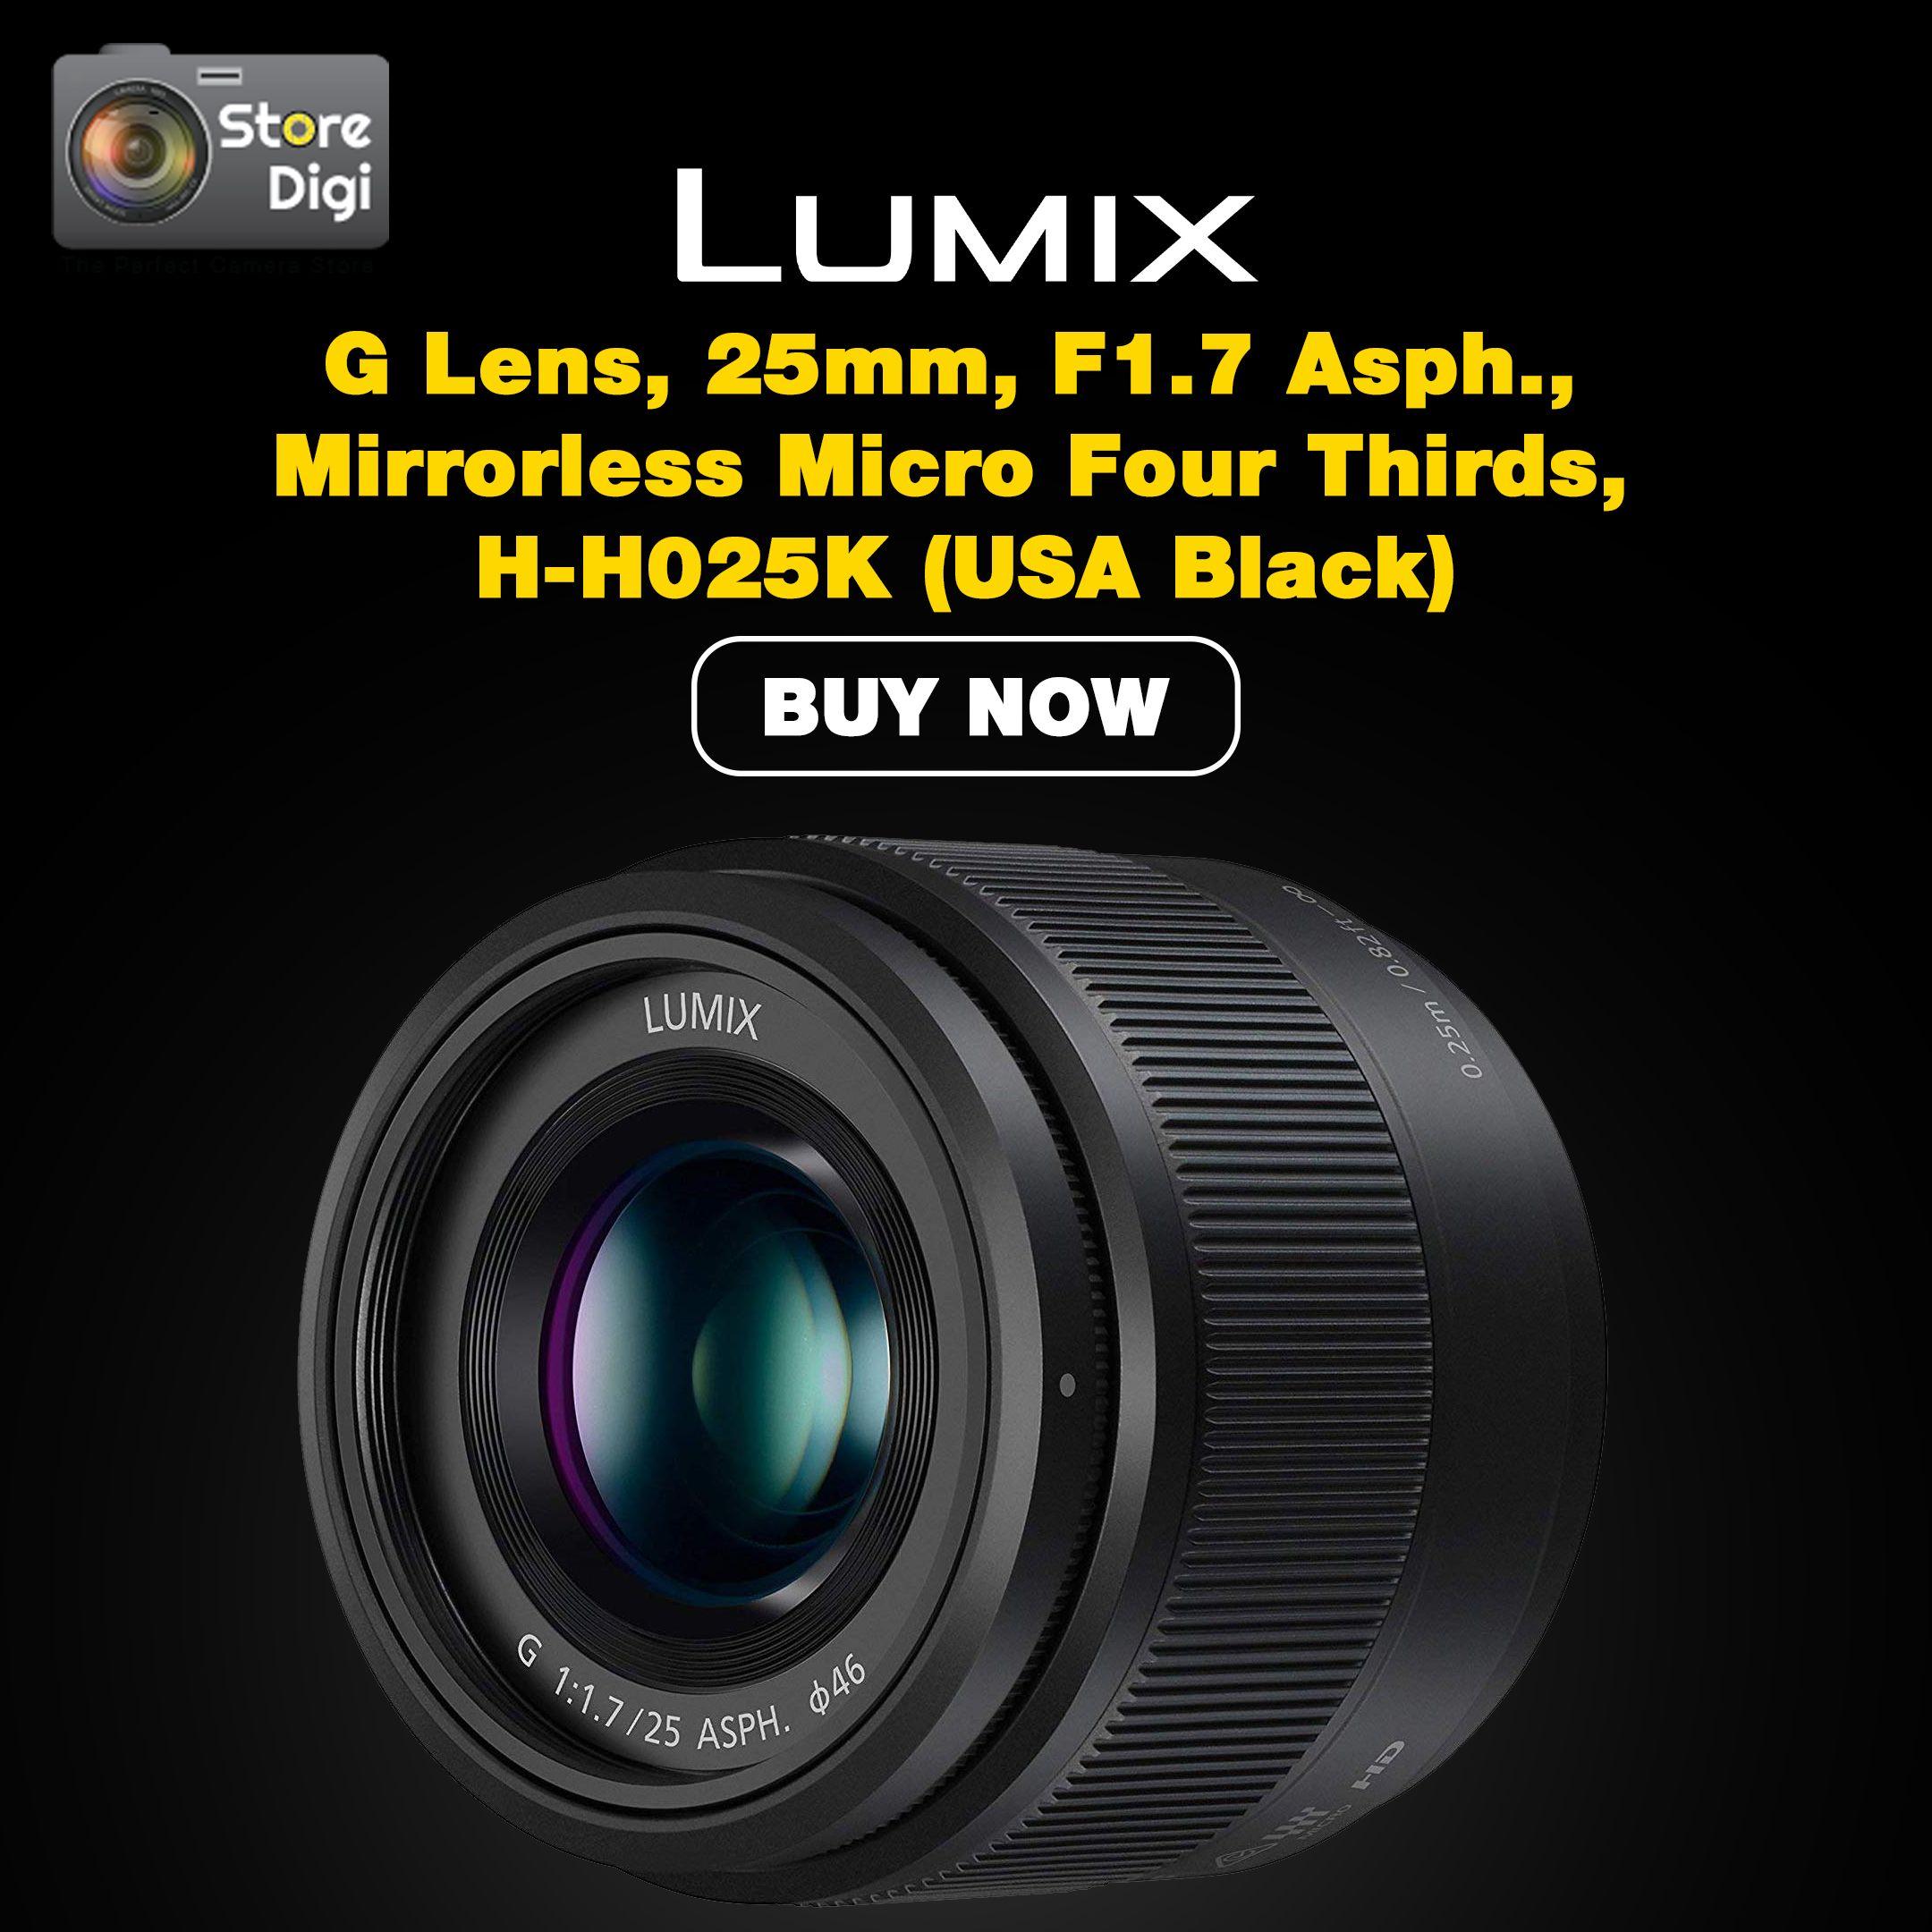 Buy Panasonic Lumix G Lens 25mm F1 7 Asph Mirrorless Micro Four Thirds H H025k Store Digi Panasonic Lumix Point And Shoot Camera Lens